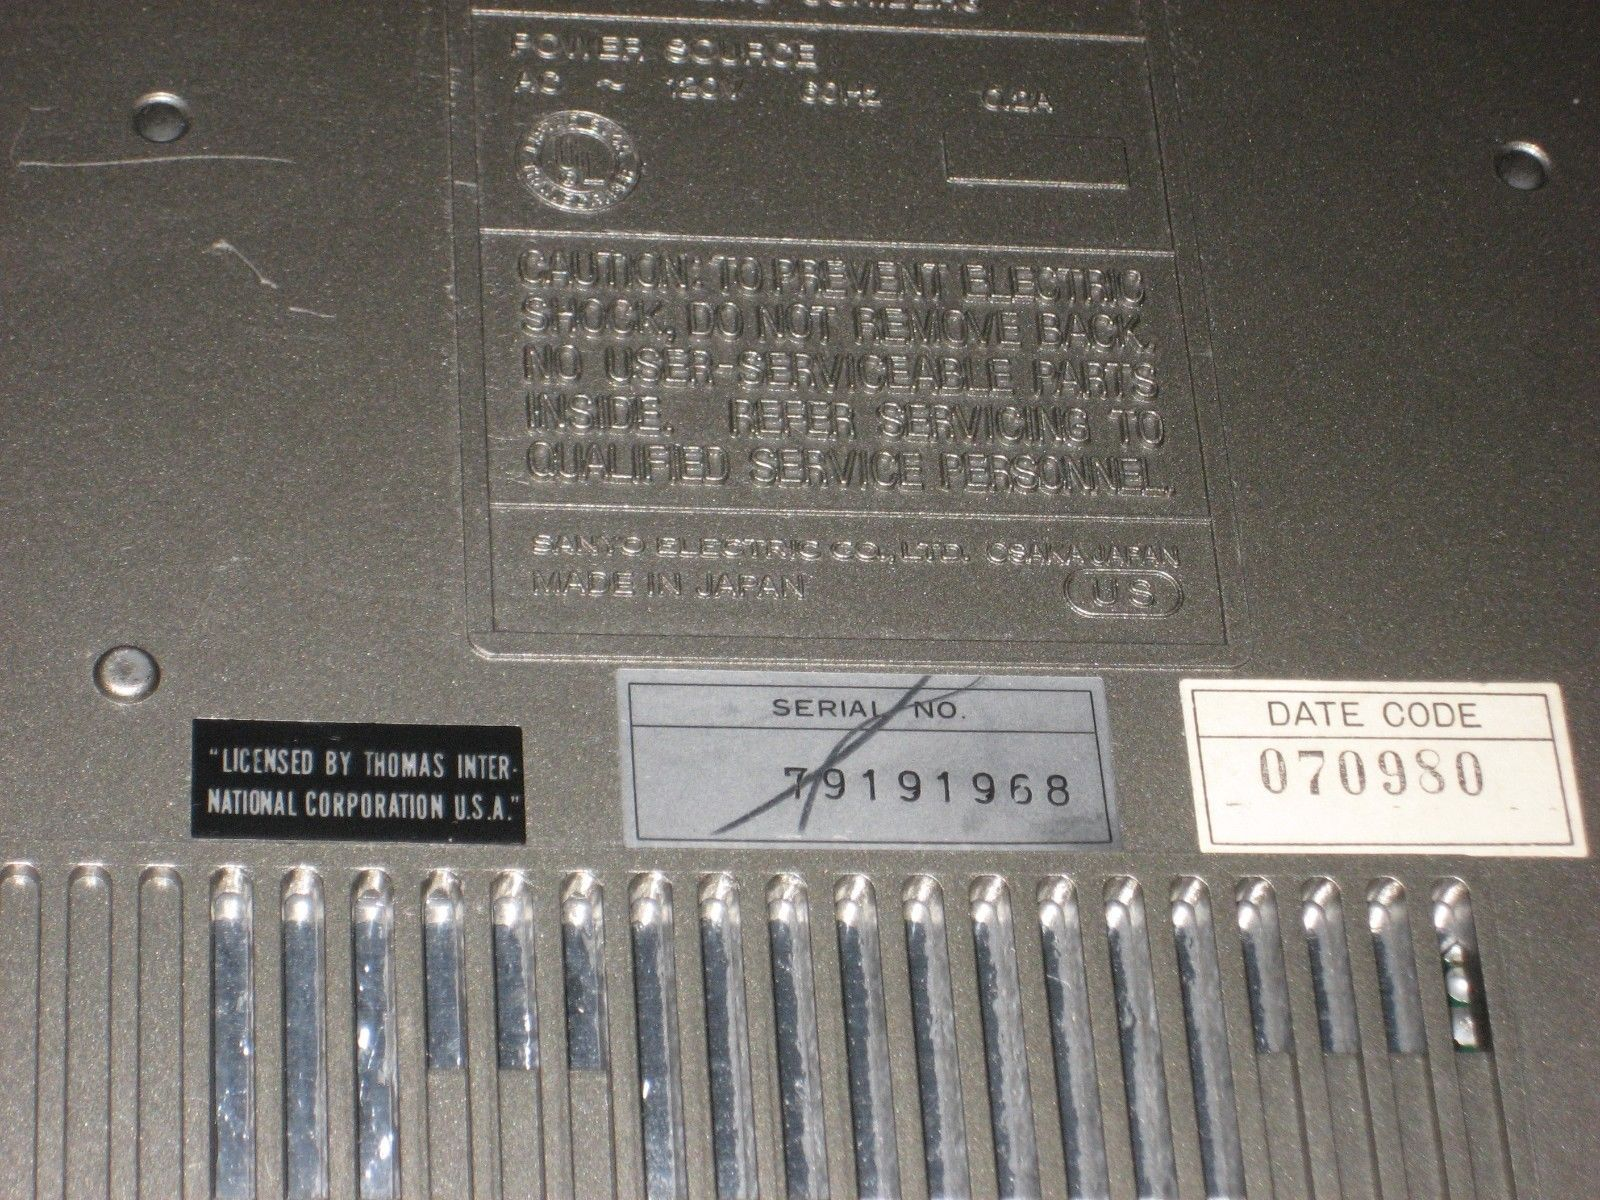 Sanyo Memo Scriber TRC 8070, Vintage MIJapan and 50 similar items